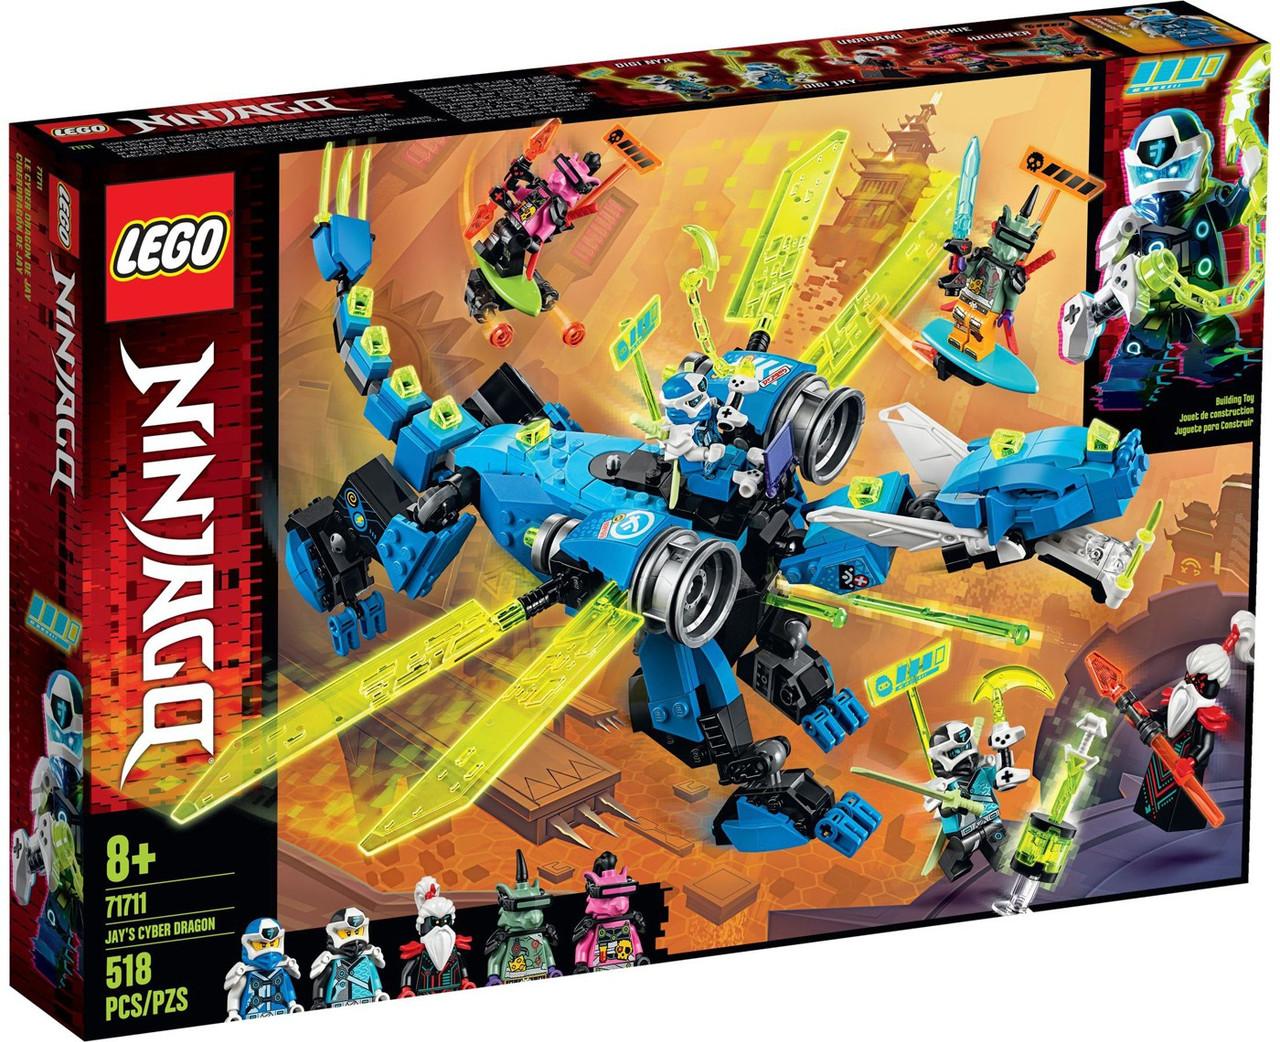 LEGO Ninjago Jays Cyber Dragon Set 71711 - ToyWiz